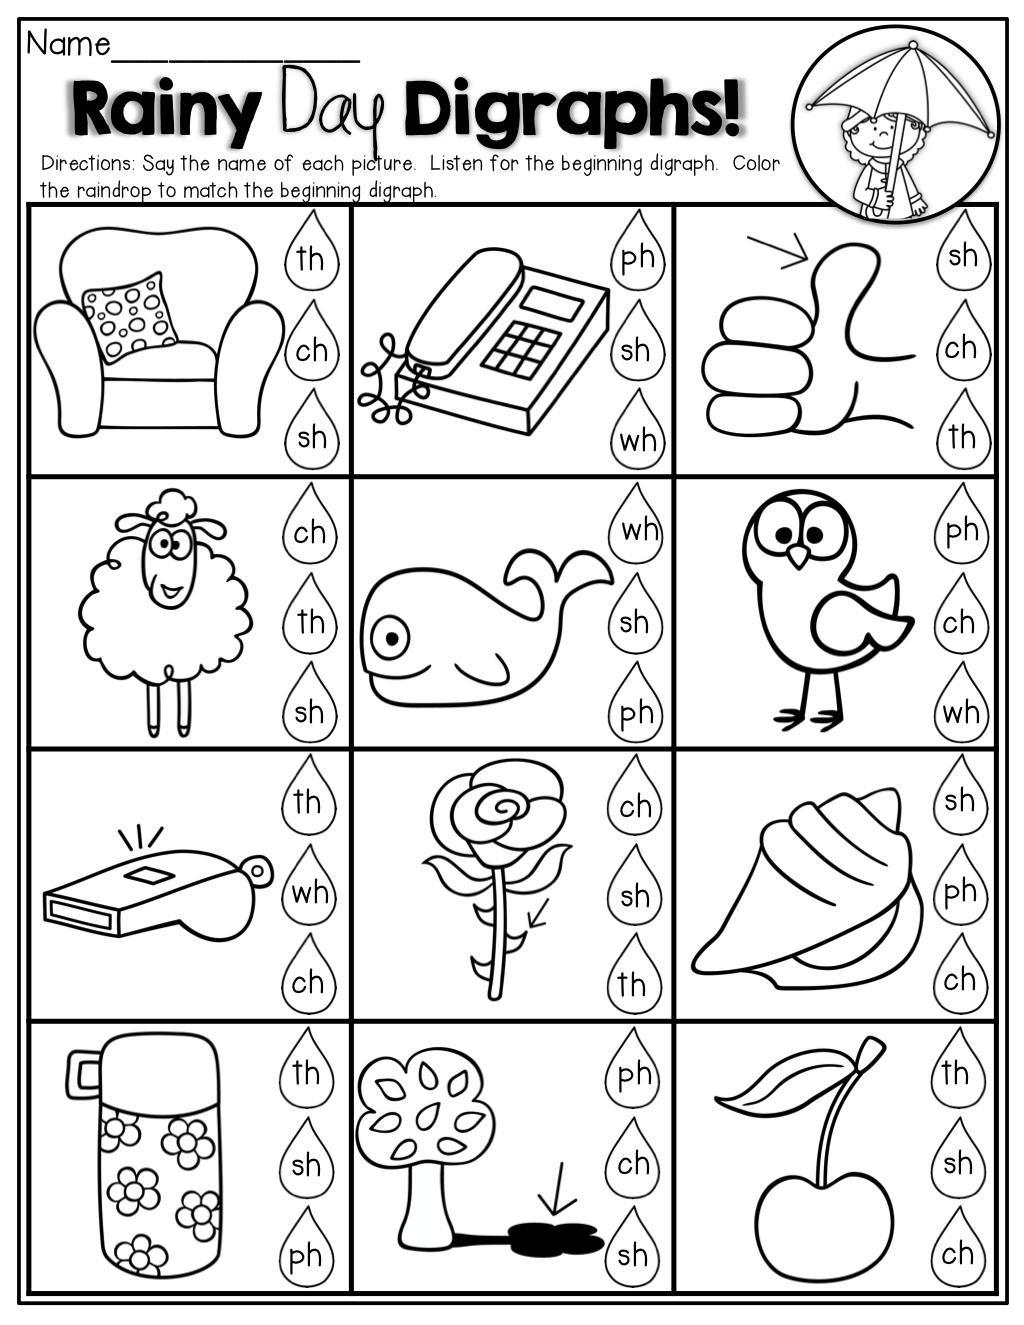 18 Free Printable Digraph Worksheets For Kindergarten Teaching Phonics Digraphs Worksheets Kindergarten Worksheets [ 1325 x 1024 Pixel ]